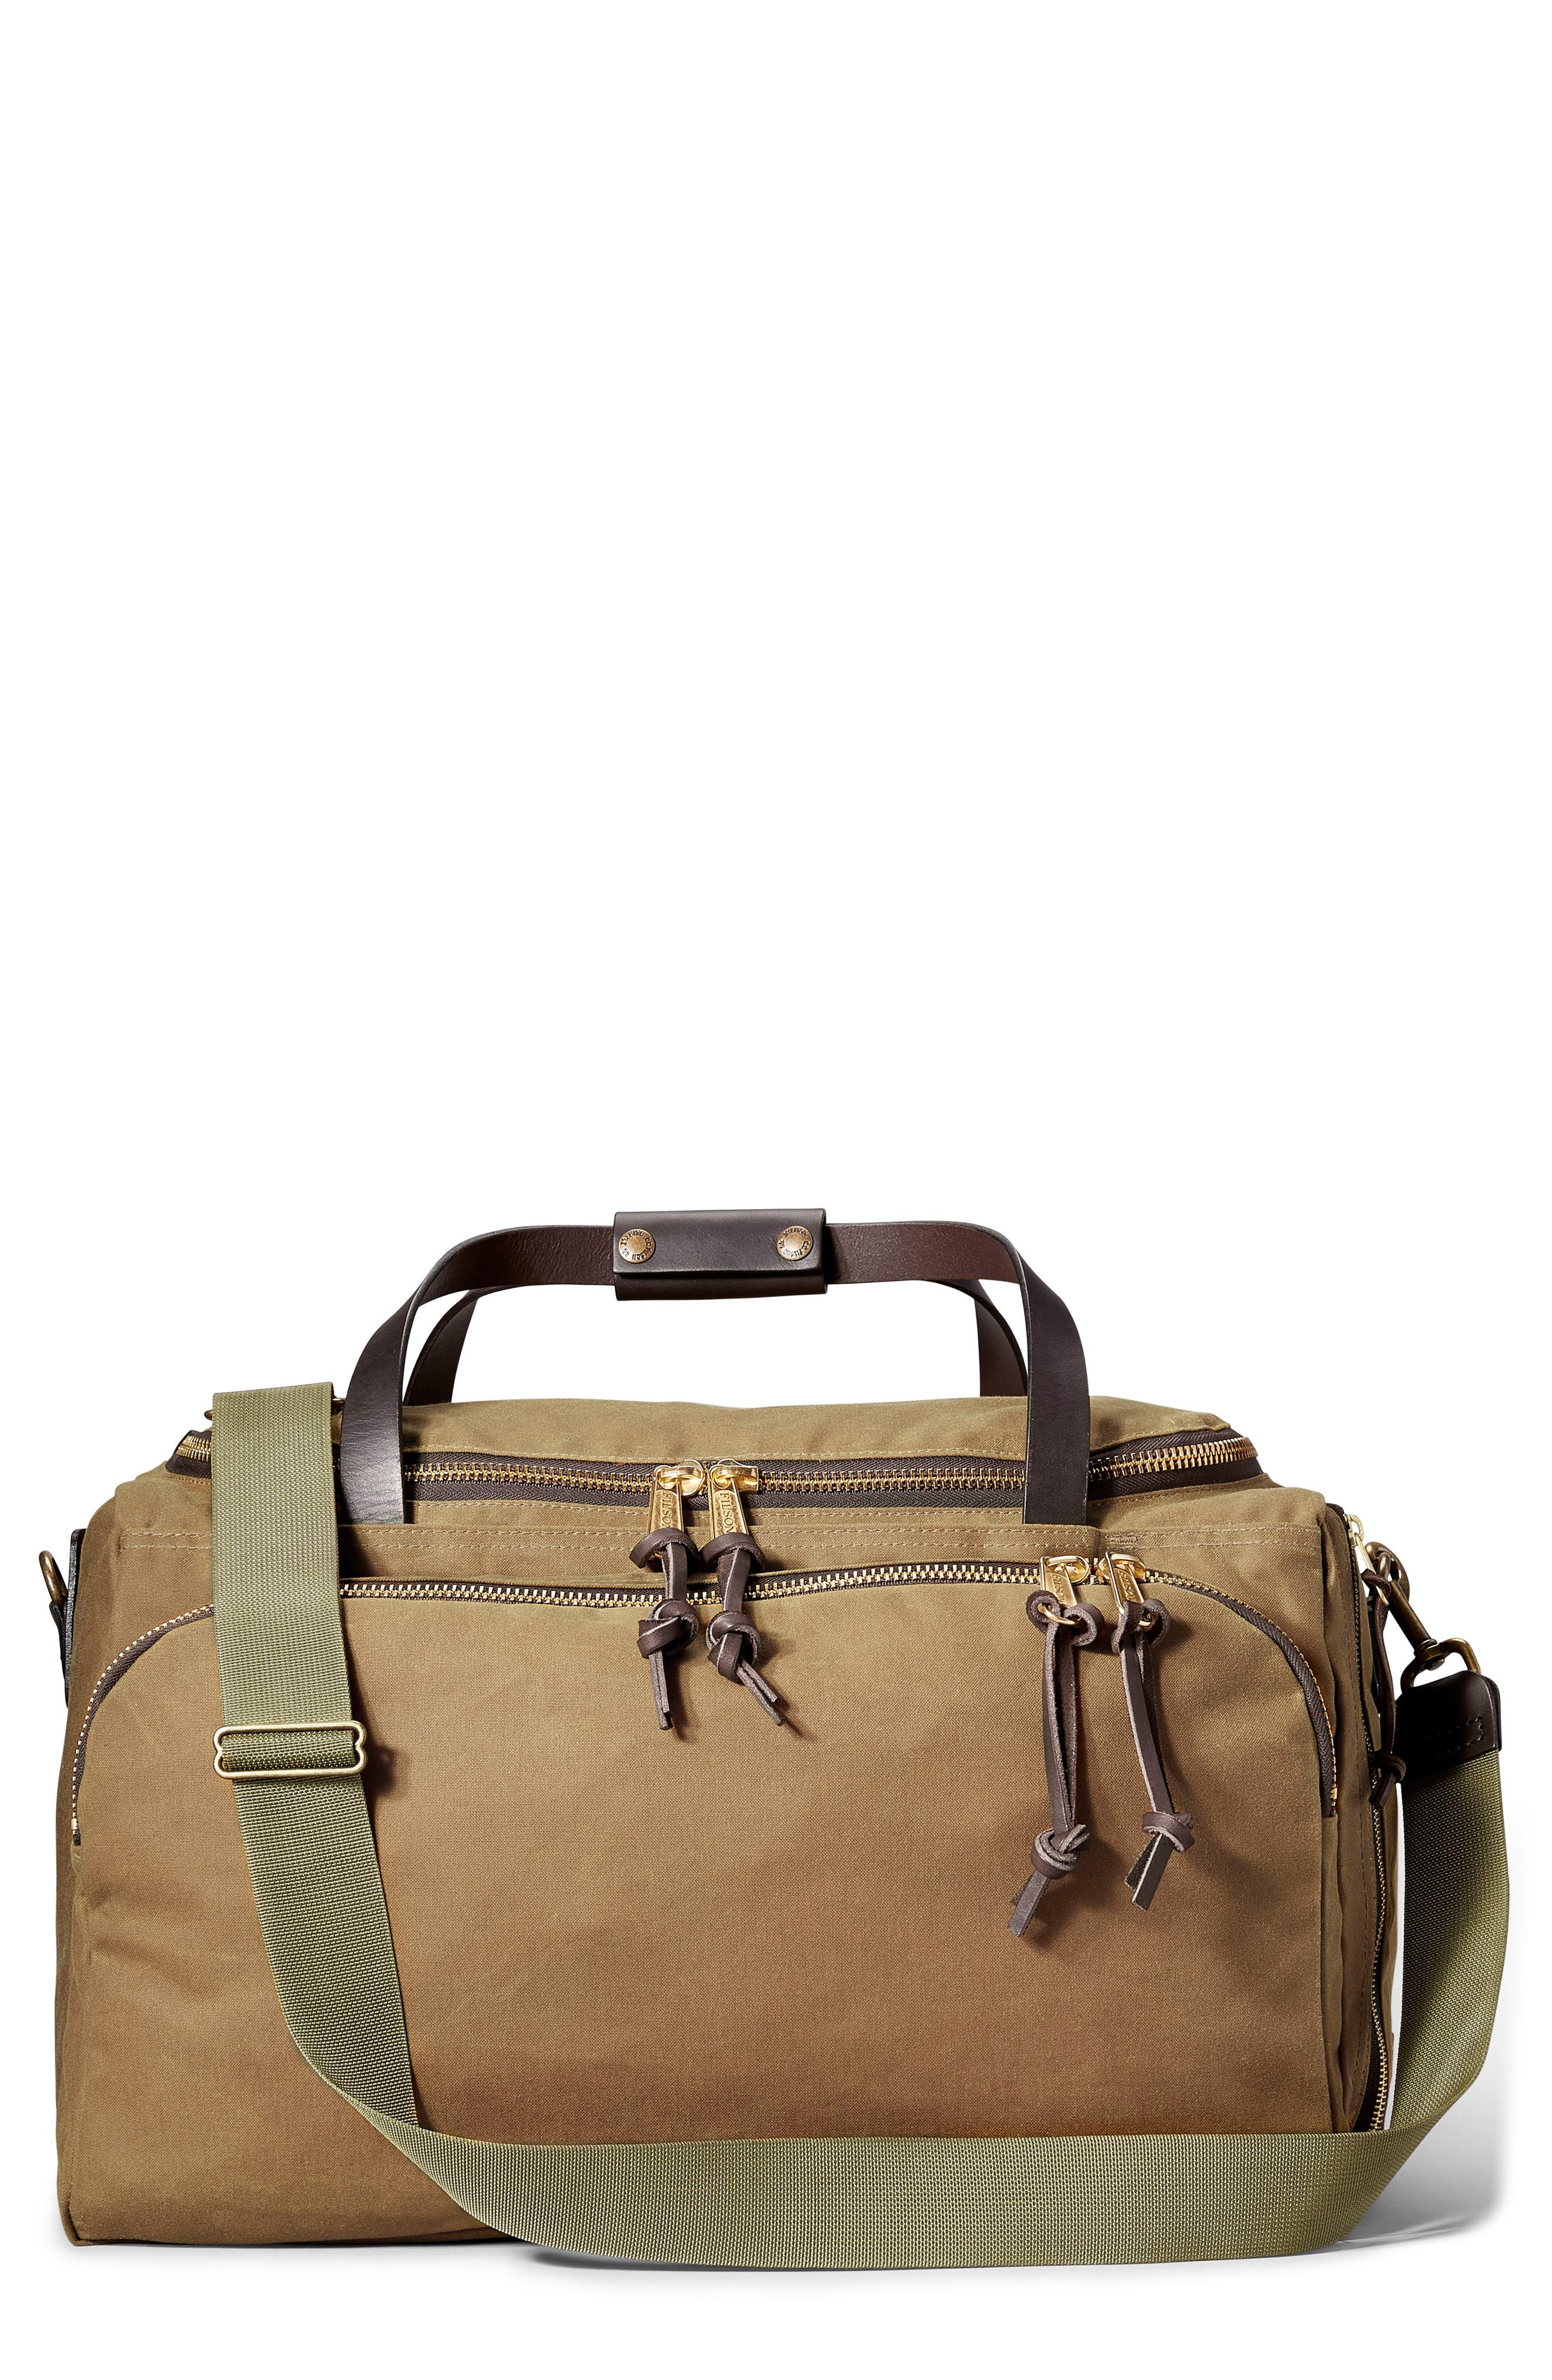 Excursion Duffel Bag,                         Main,                         color, TAN